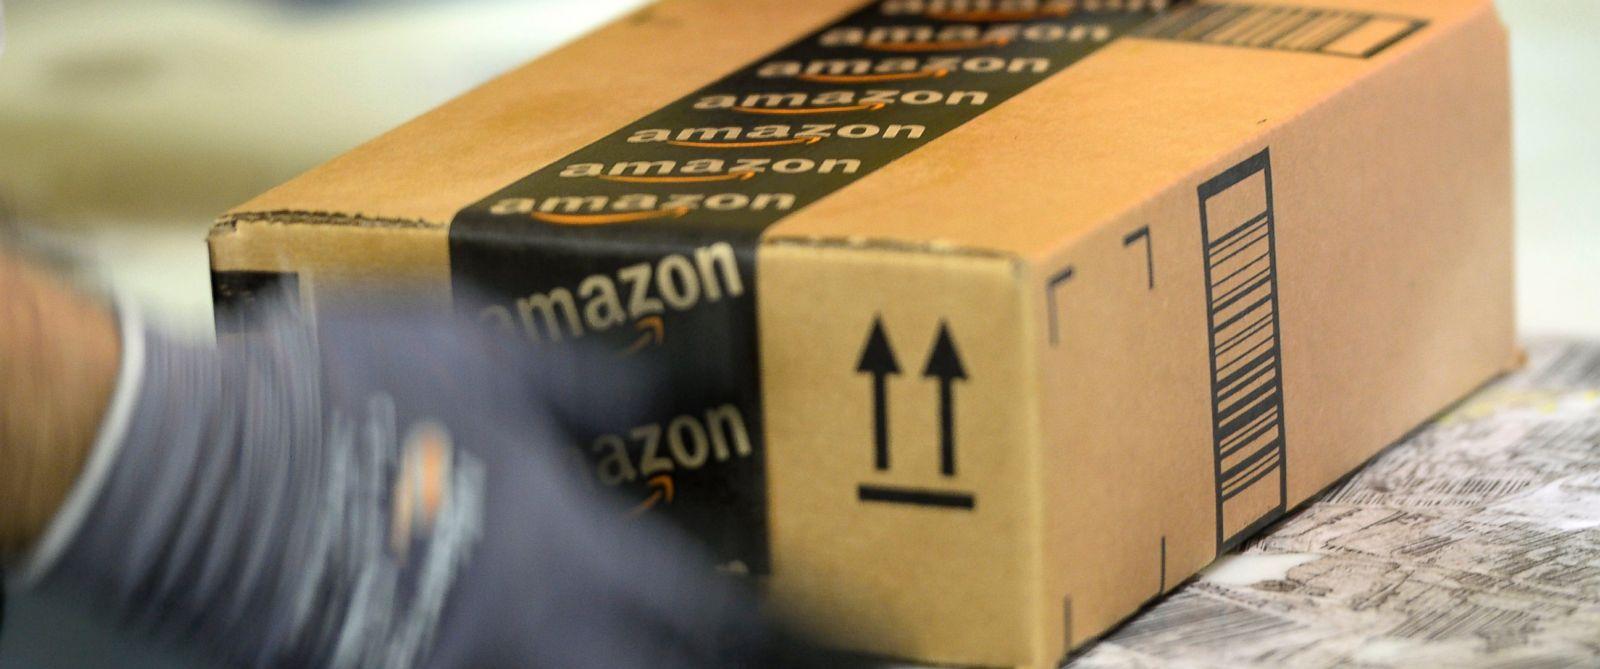 PHOTO: An employee prepares an order at Amazons fulfillment center in San Bernardino, Calif., Oct. 29, 2013.